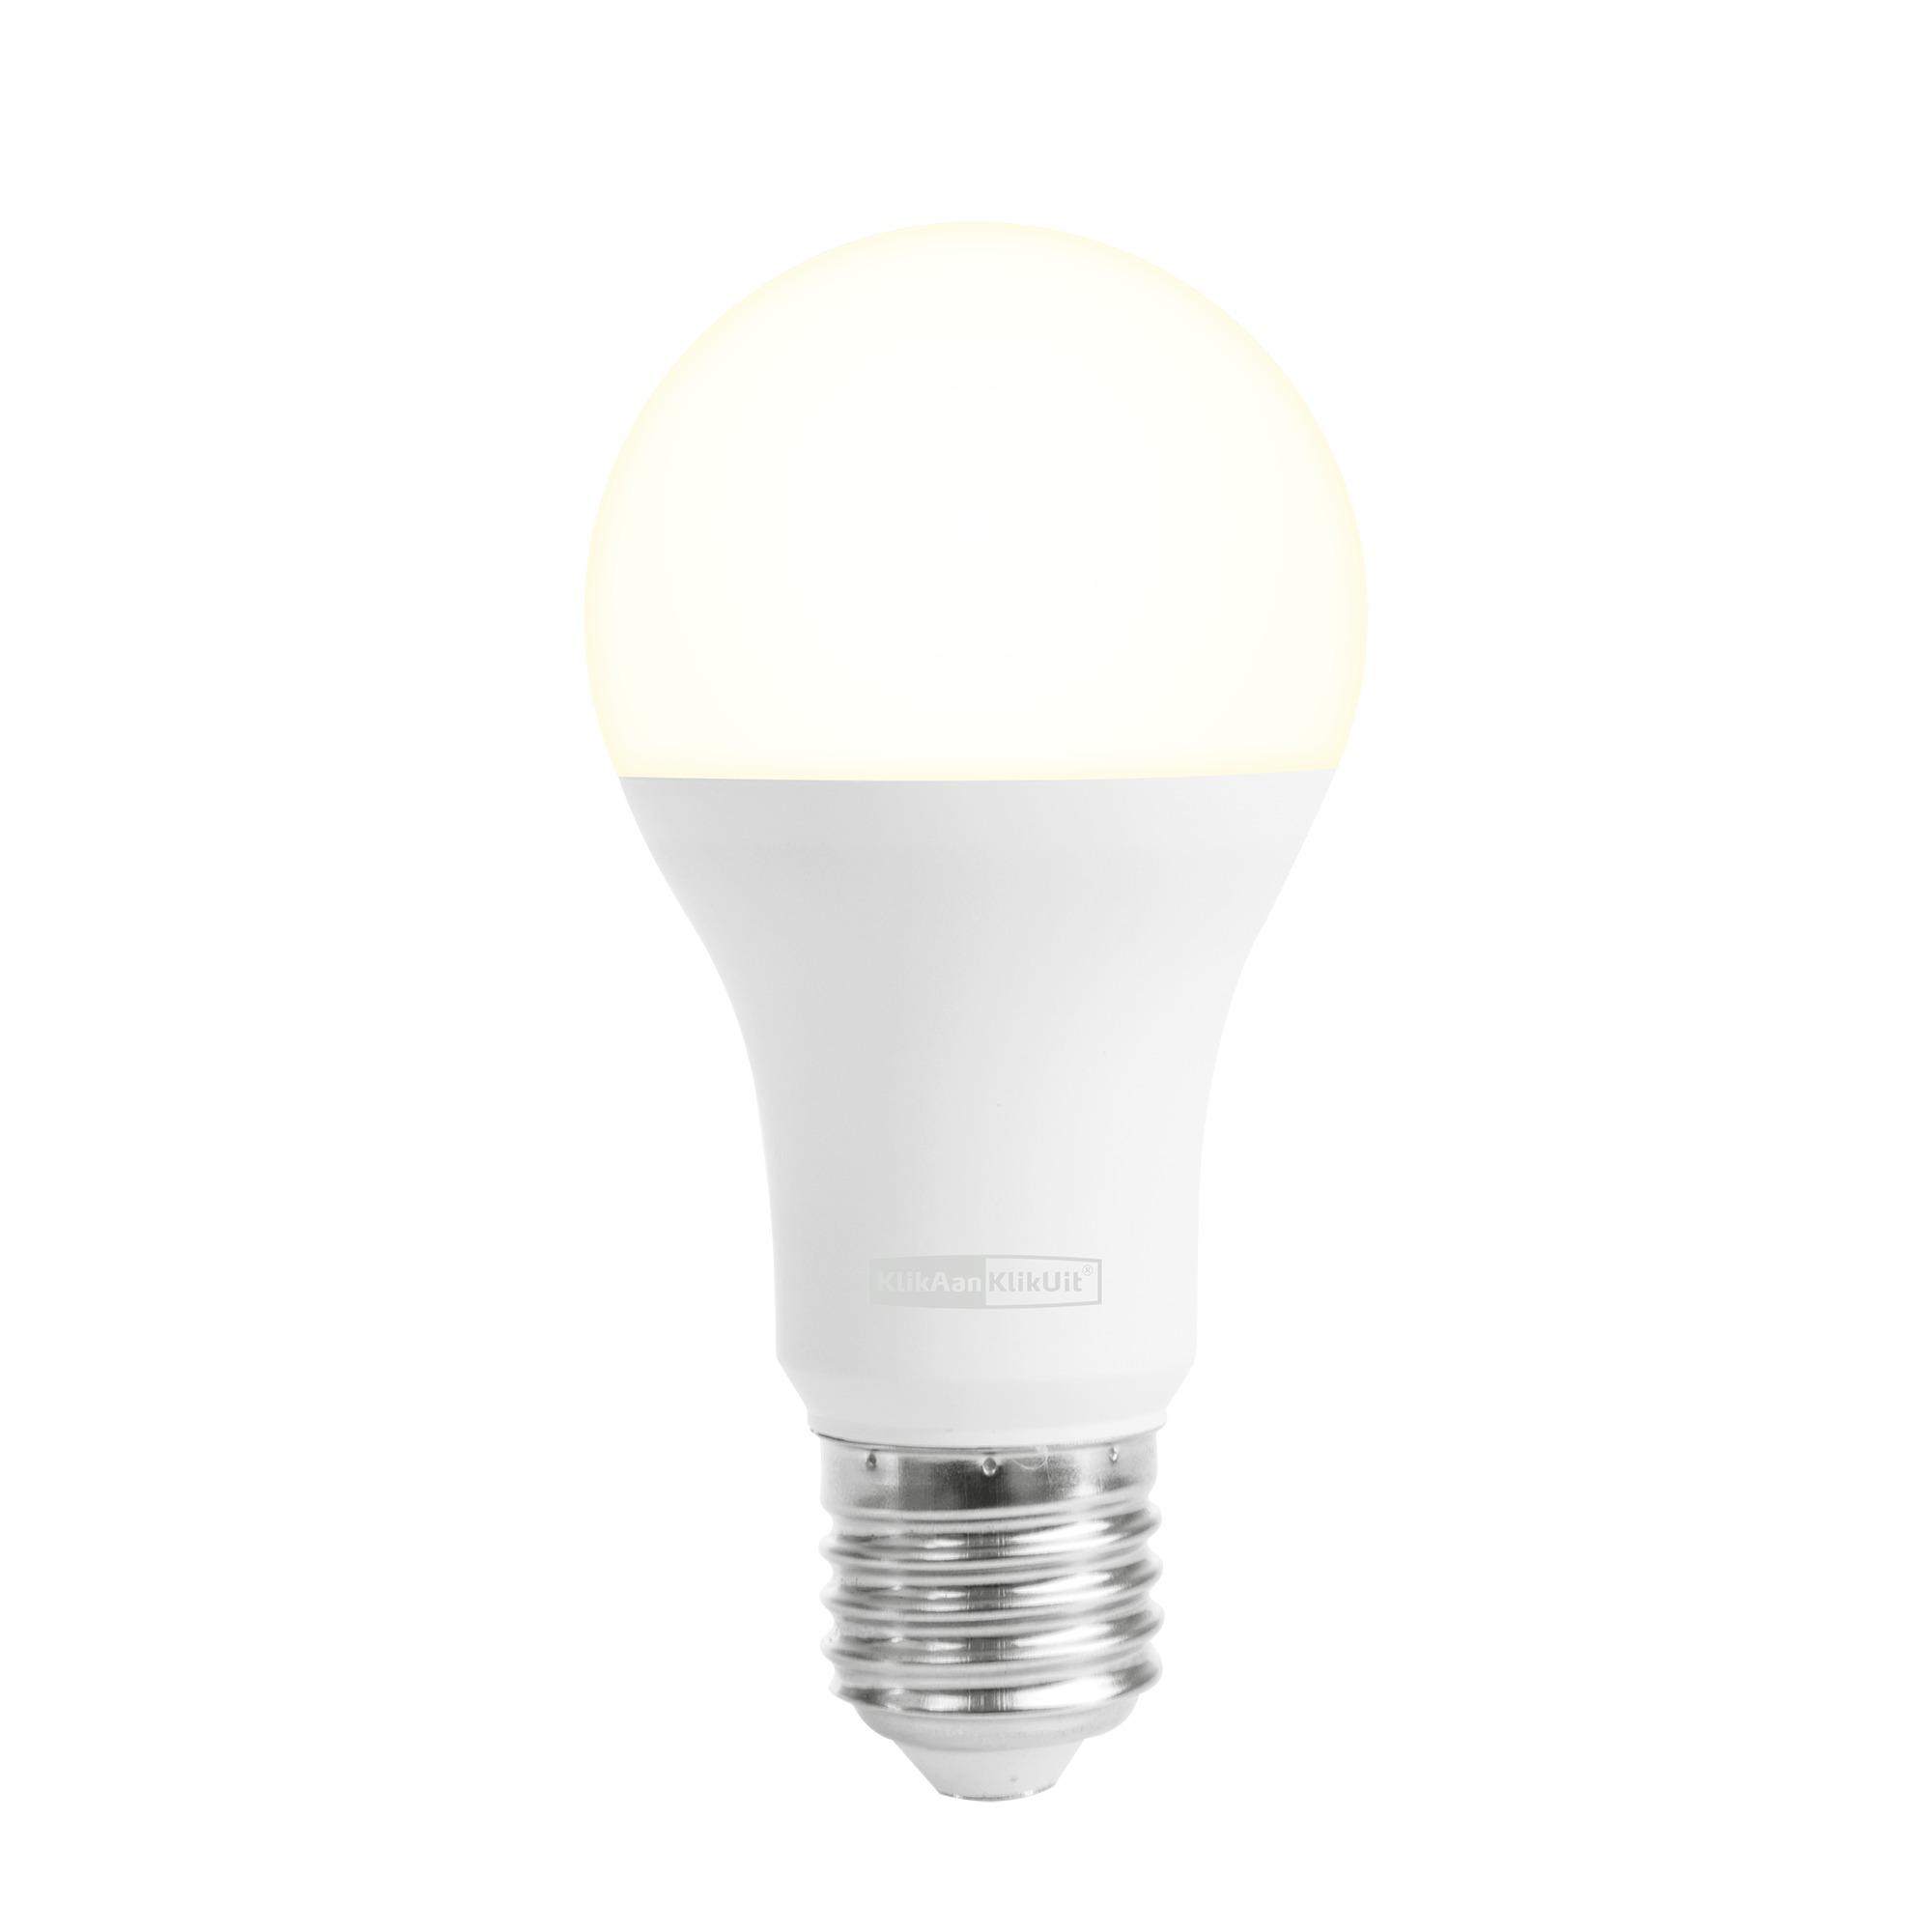 KlikAanKlikUit ALED-2709 Draadloze dimbare LEDlamp E27 9 Watt